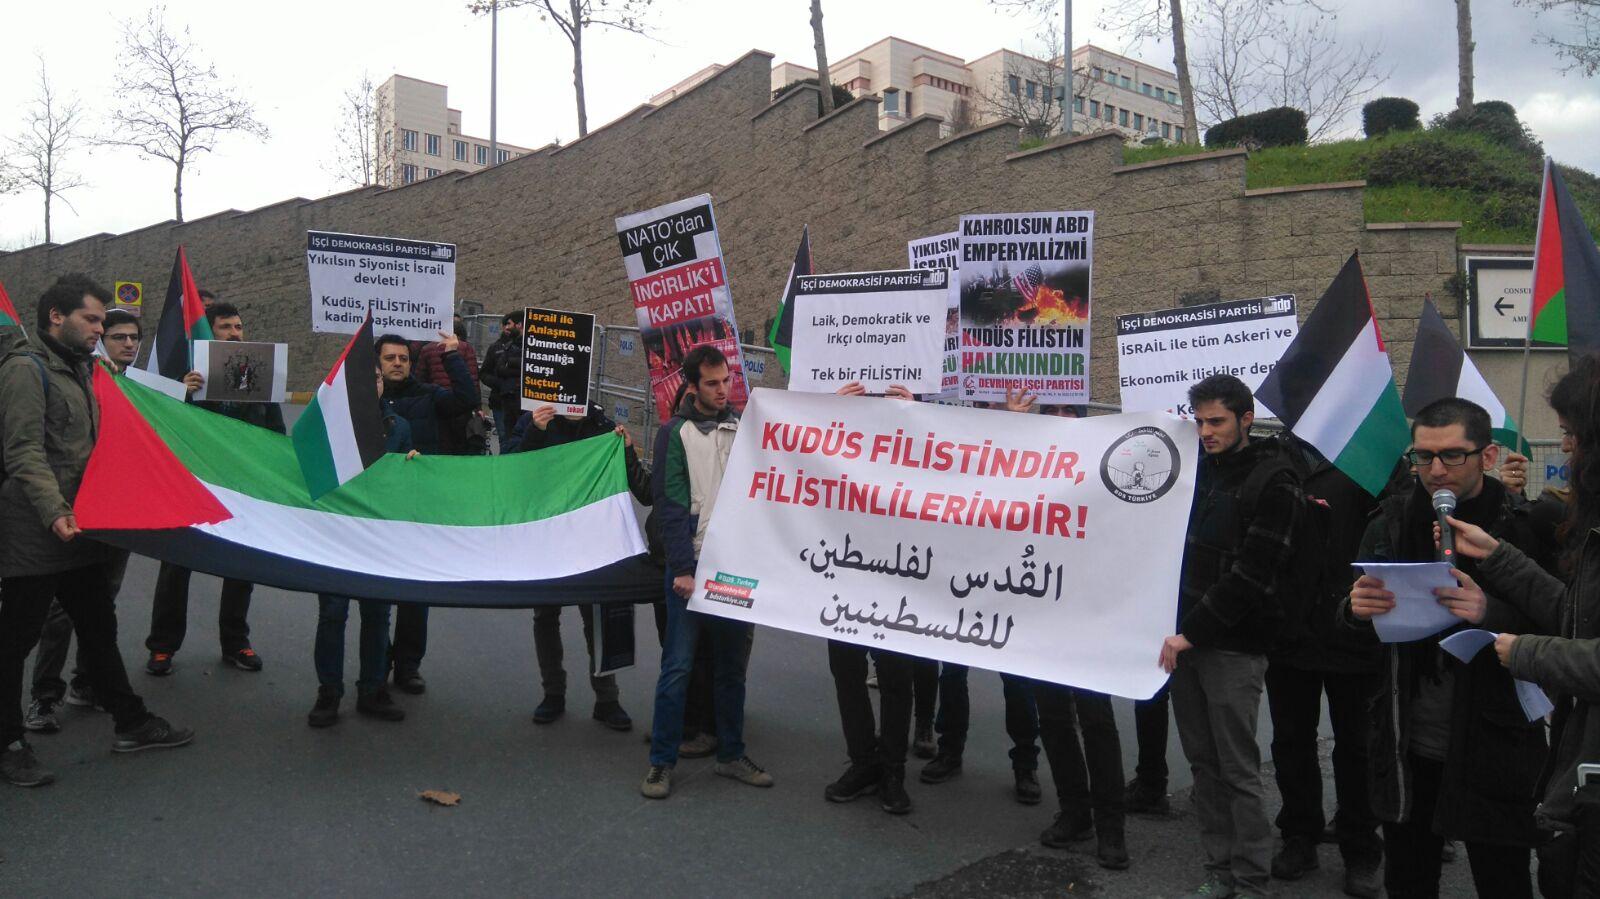 BDS Trkiye Tarafndan Stanbul Stinyedeki ABD Konsolosluu Nnde Kuds Filistindir Filistinlilerindir Temasyla Bir Basn Aklamas